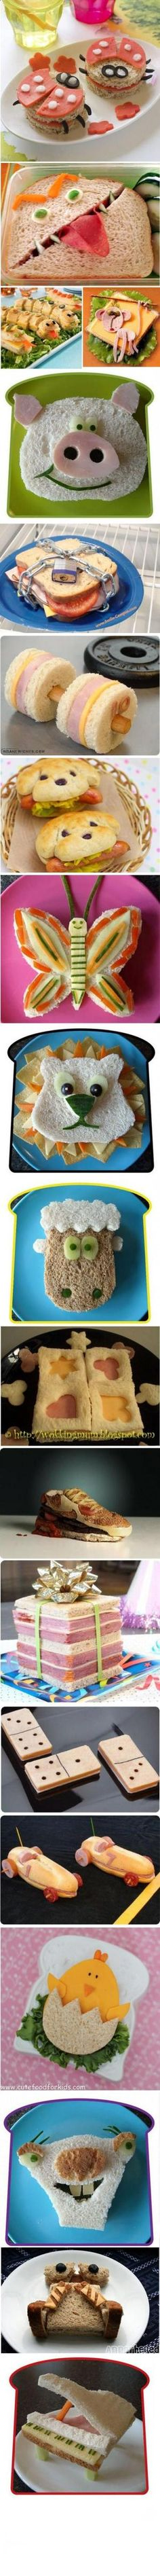 Nice ideas to make your kid's lunch a highlight of the day / Schöne Ideen, wie man das Mittag essen Cute Snacks, Snacks Für Party, Cute Food, Good Food, Toddler Meals, Kids Meals, Sandwich Original, Childrens Meals, Food Decoration